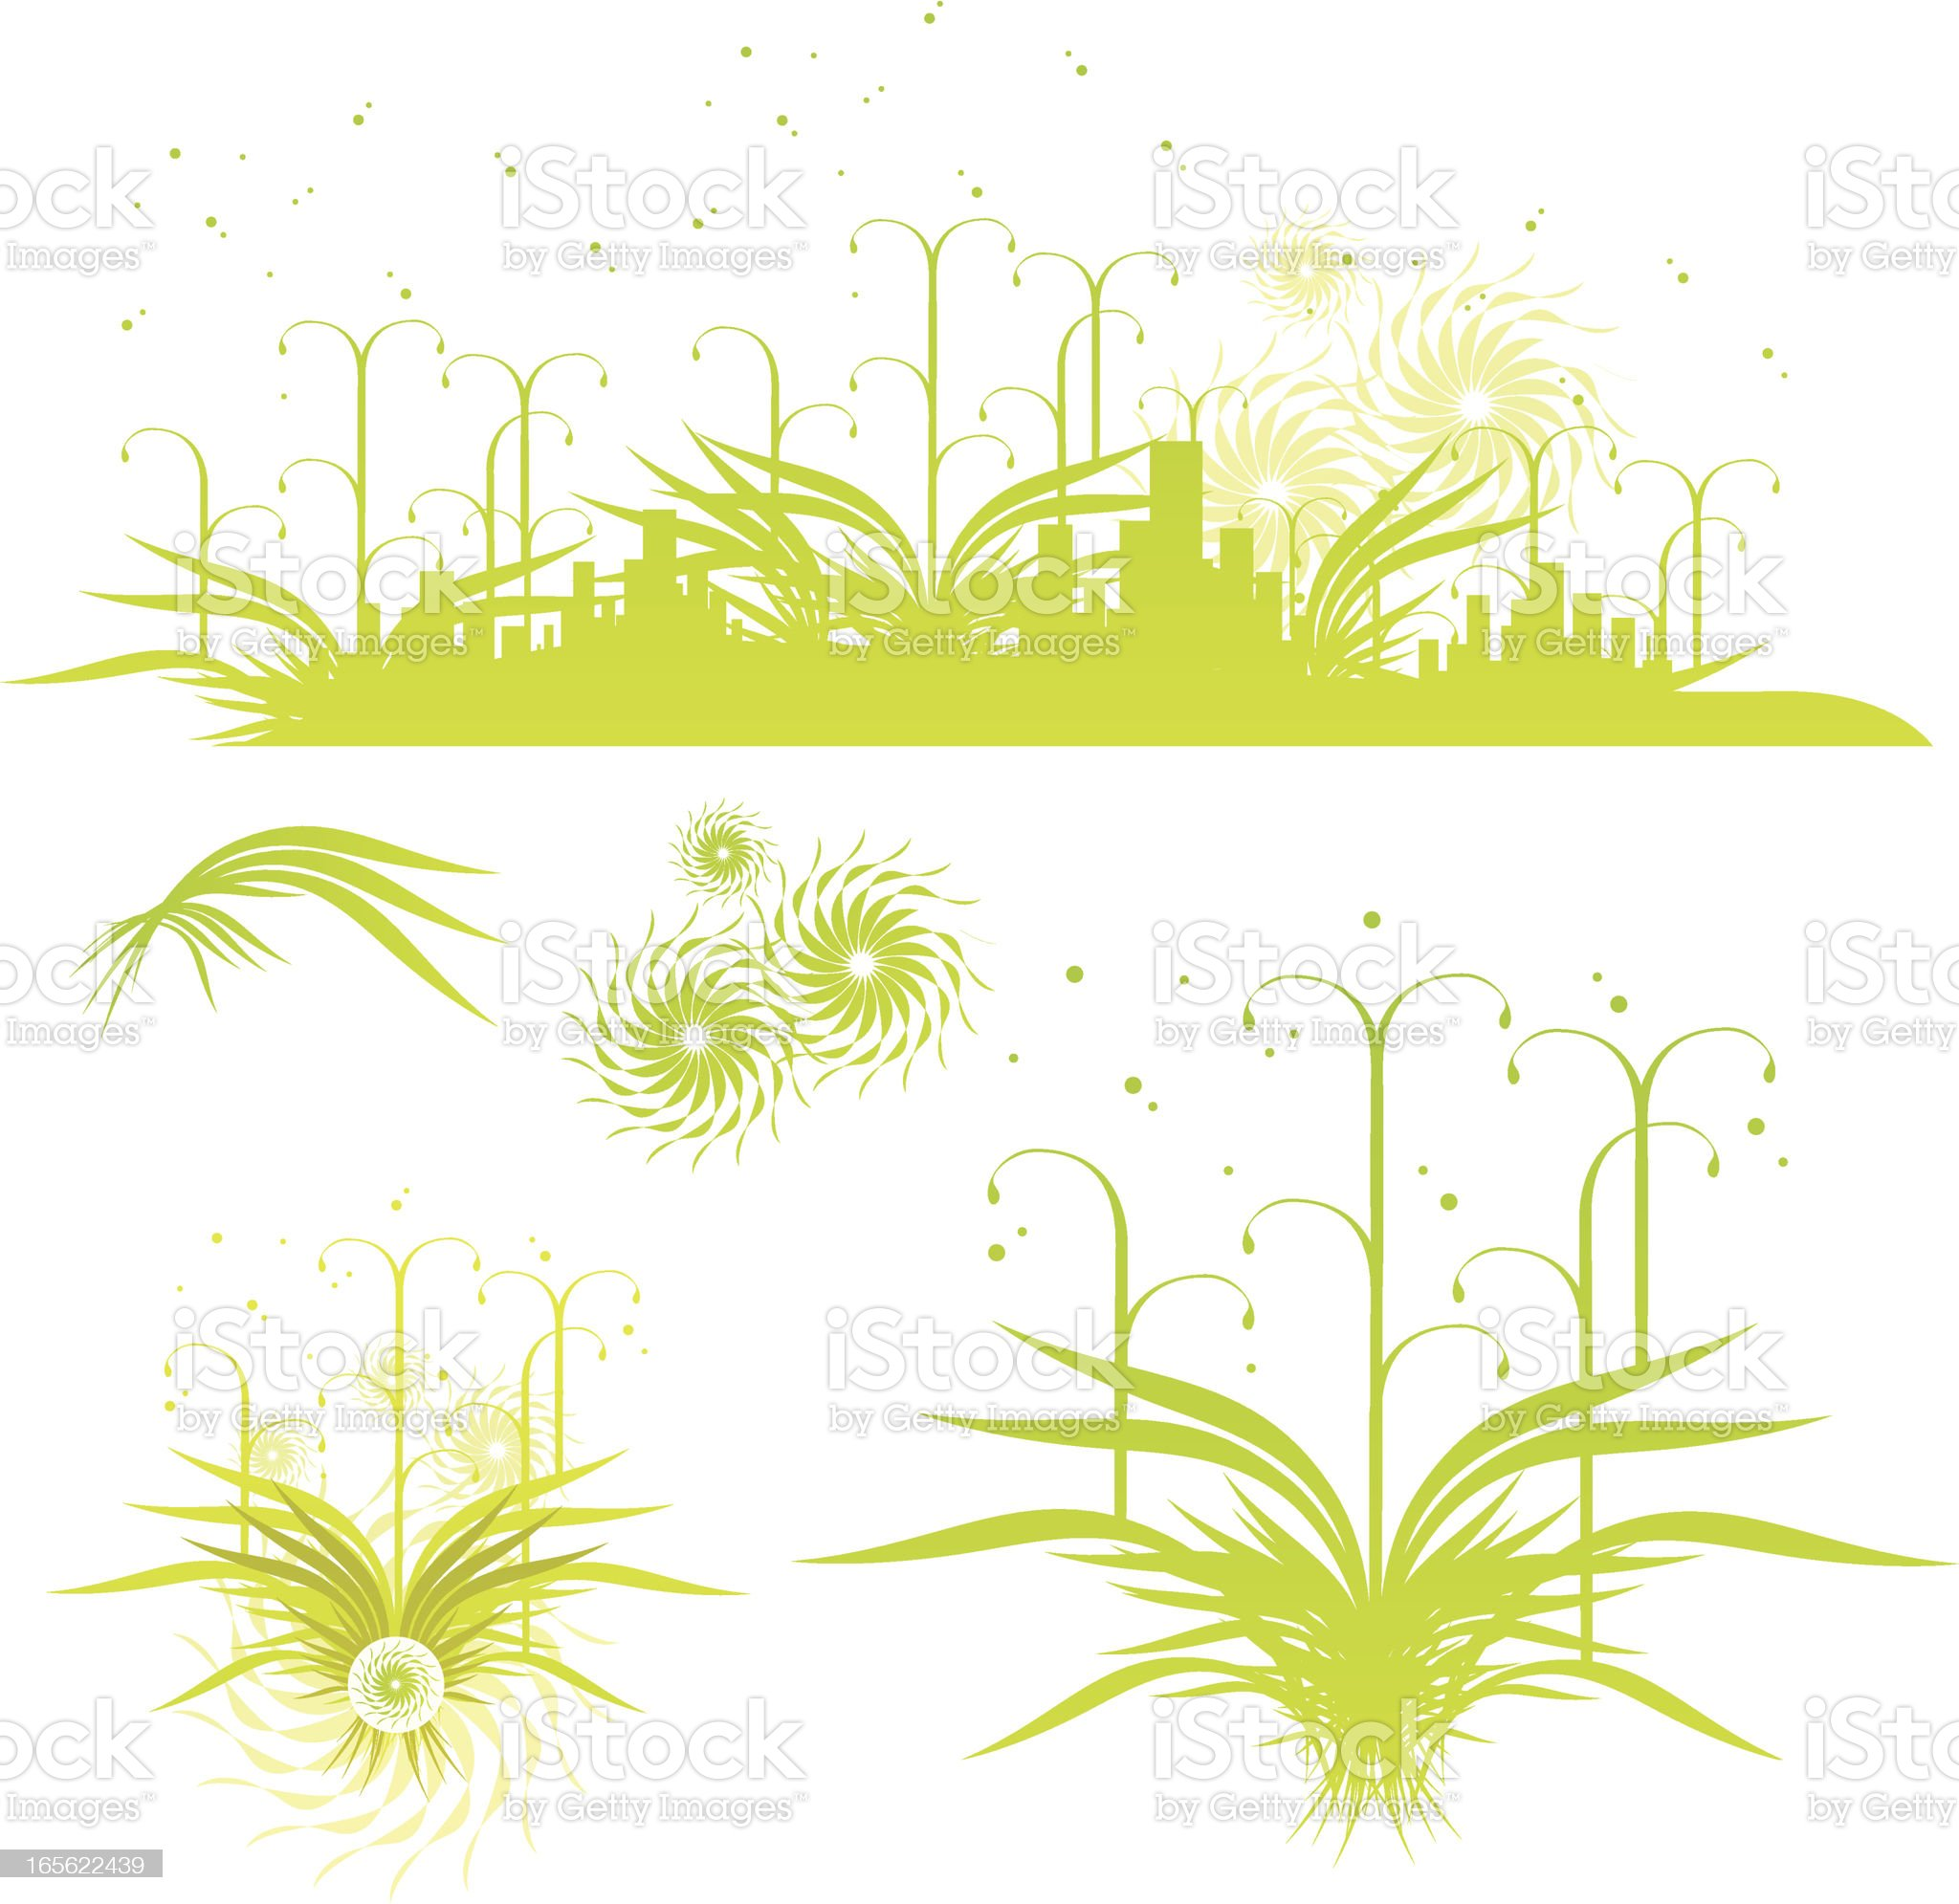 crazy green city profile royalty-free stock vector art